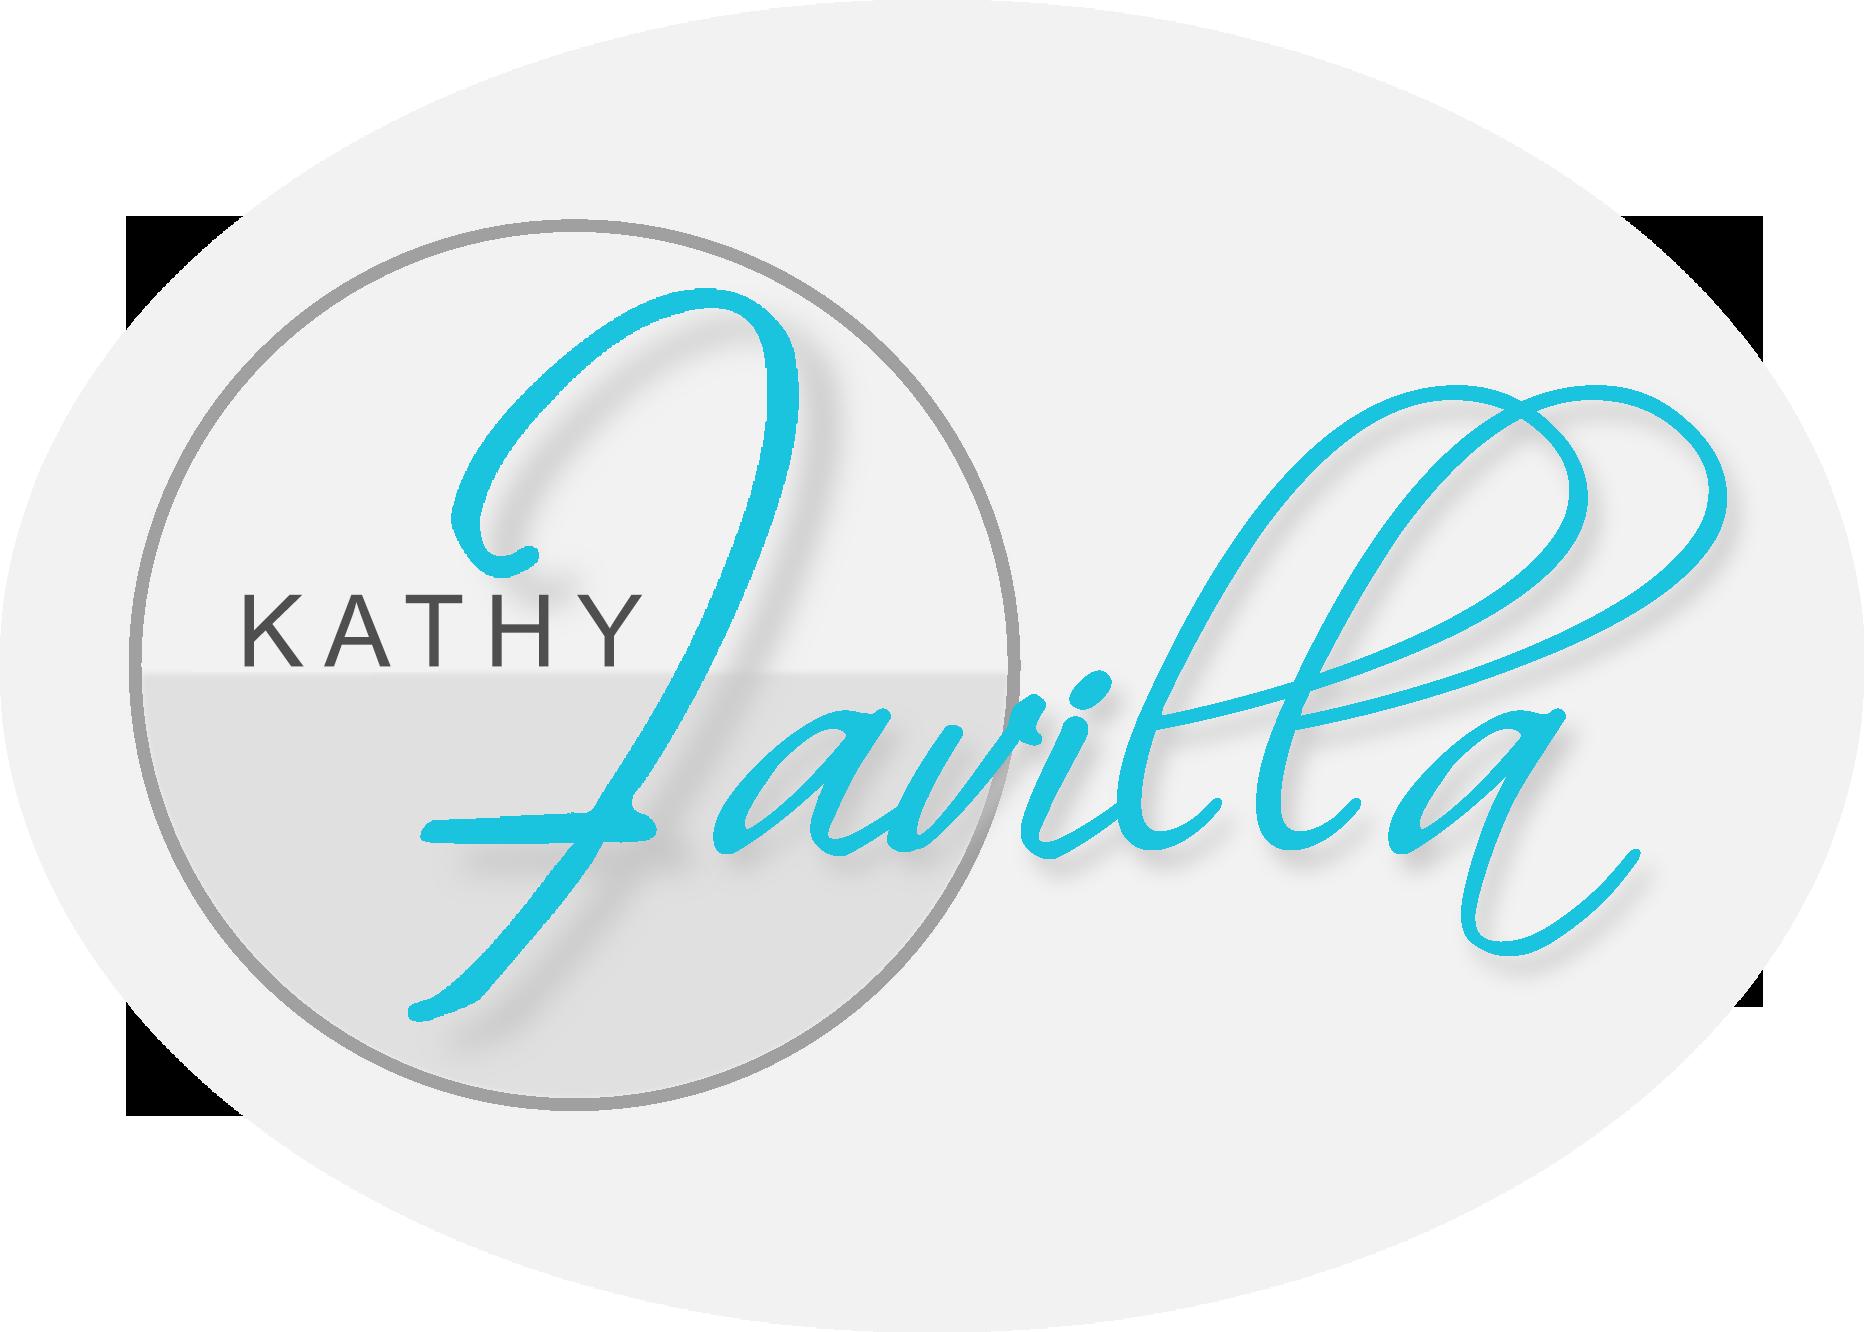 kathyfavilla.com